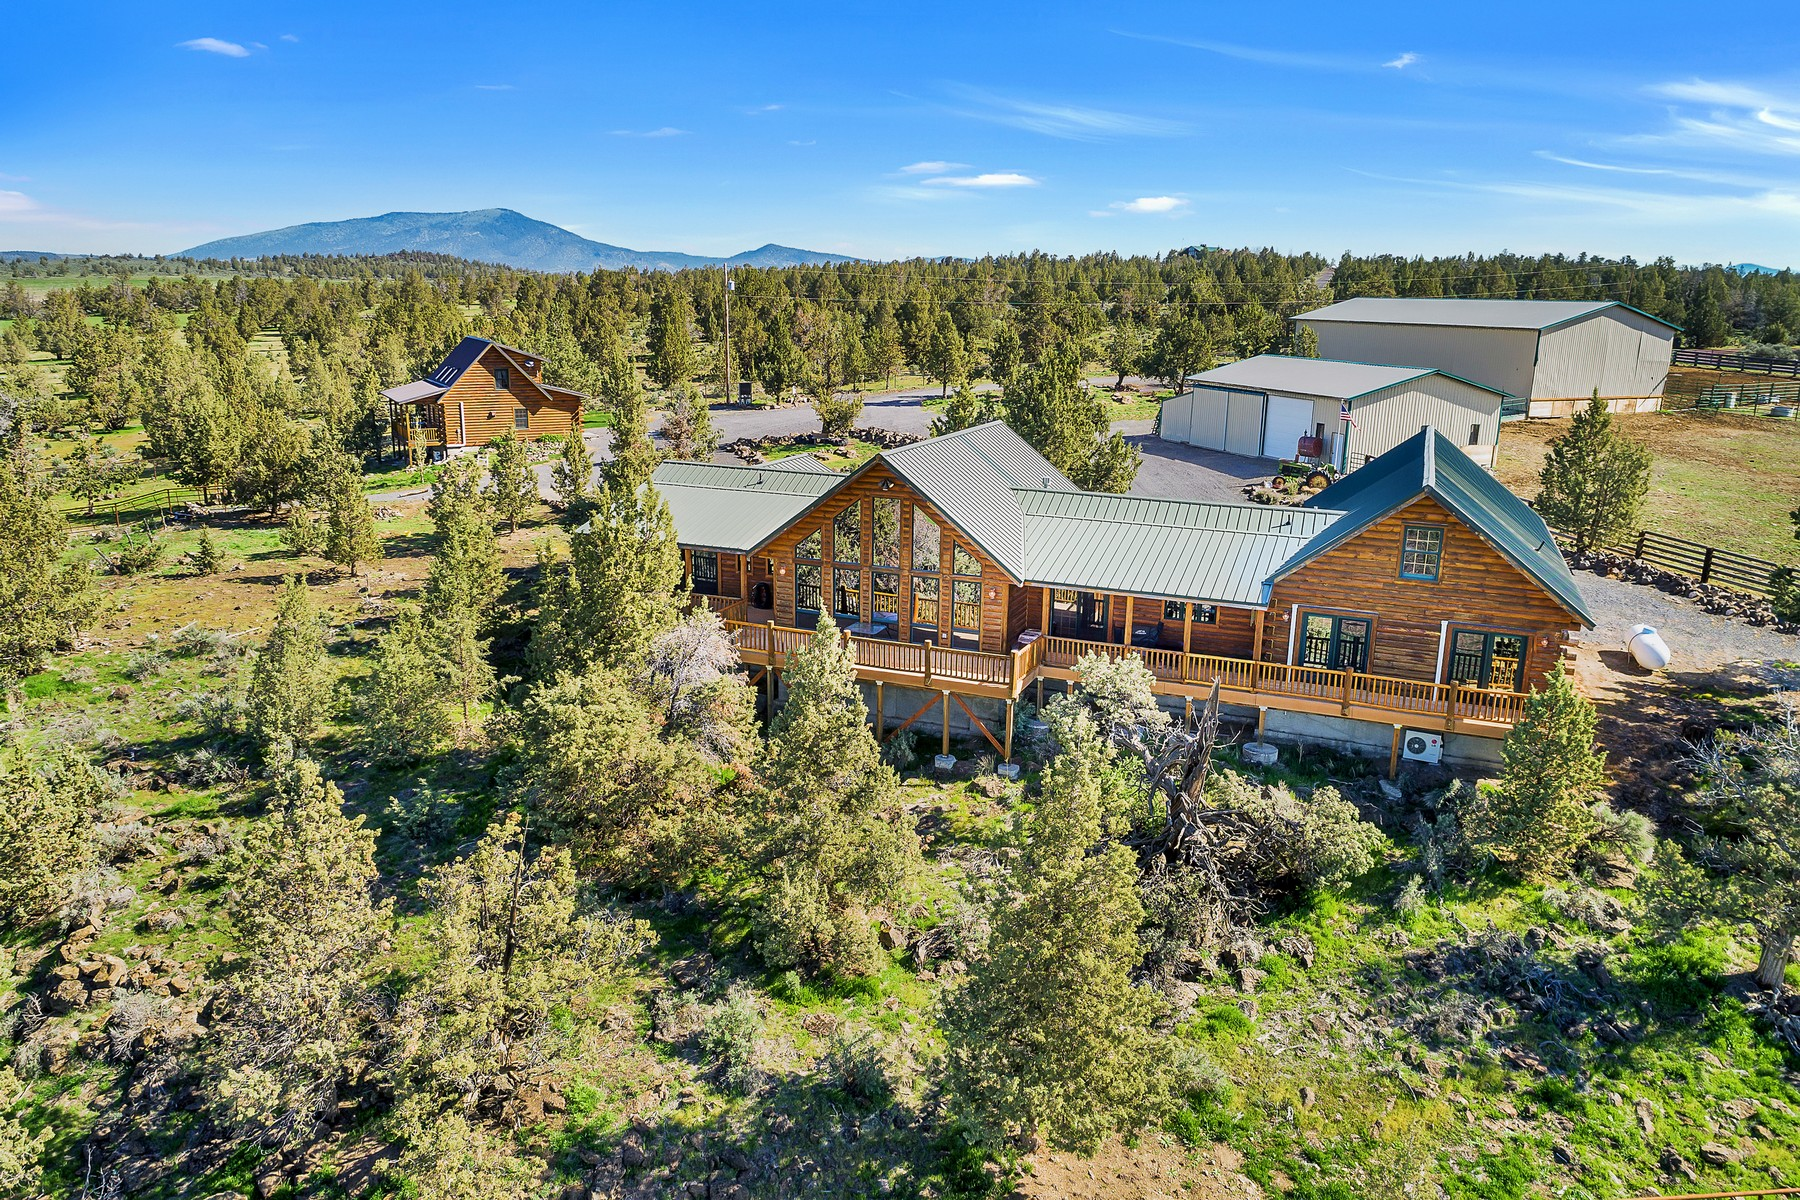 Other Residential Homes για την Πώληση στο 2001 NW McDaniel Road Powell Butte, OR 97753 Powell Butte, Ορεγκον 97753 Ηνωμένες Πολιτείες